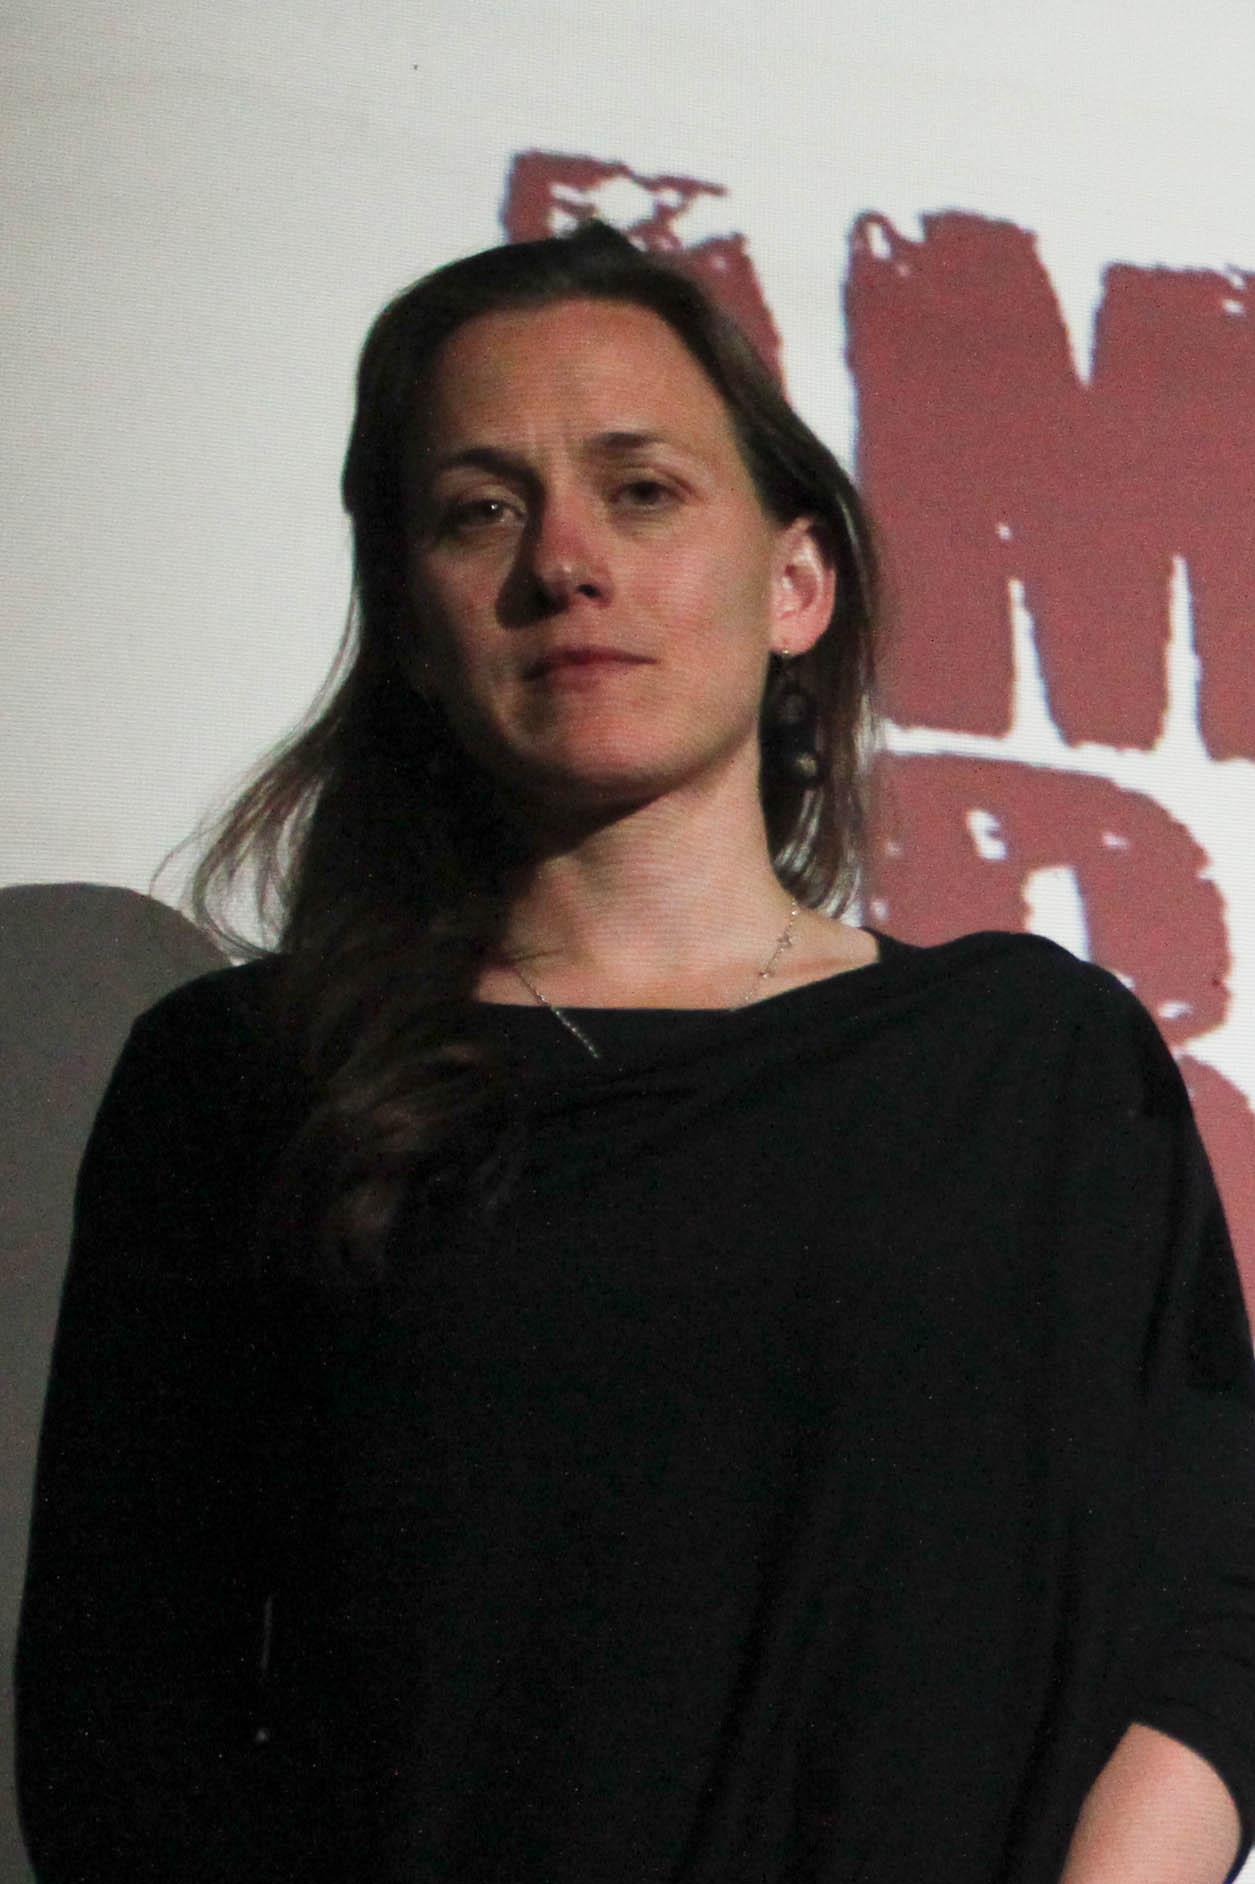 Image of Natalia Almada from Wikidata